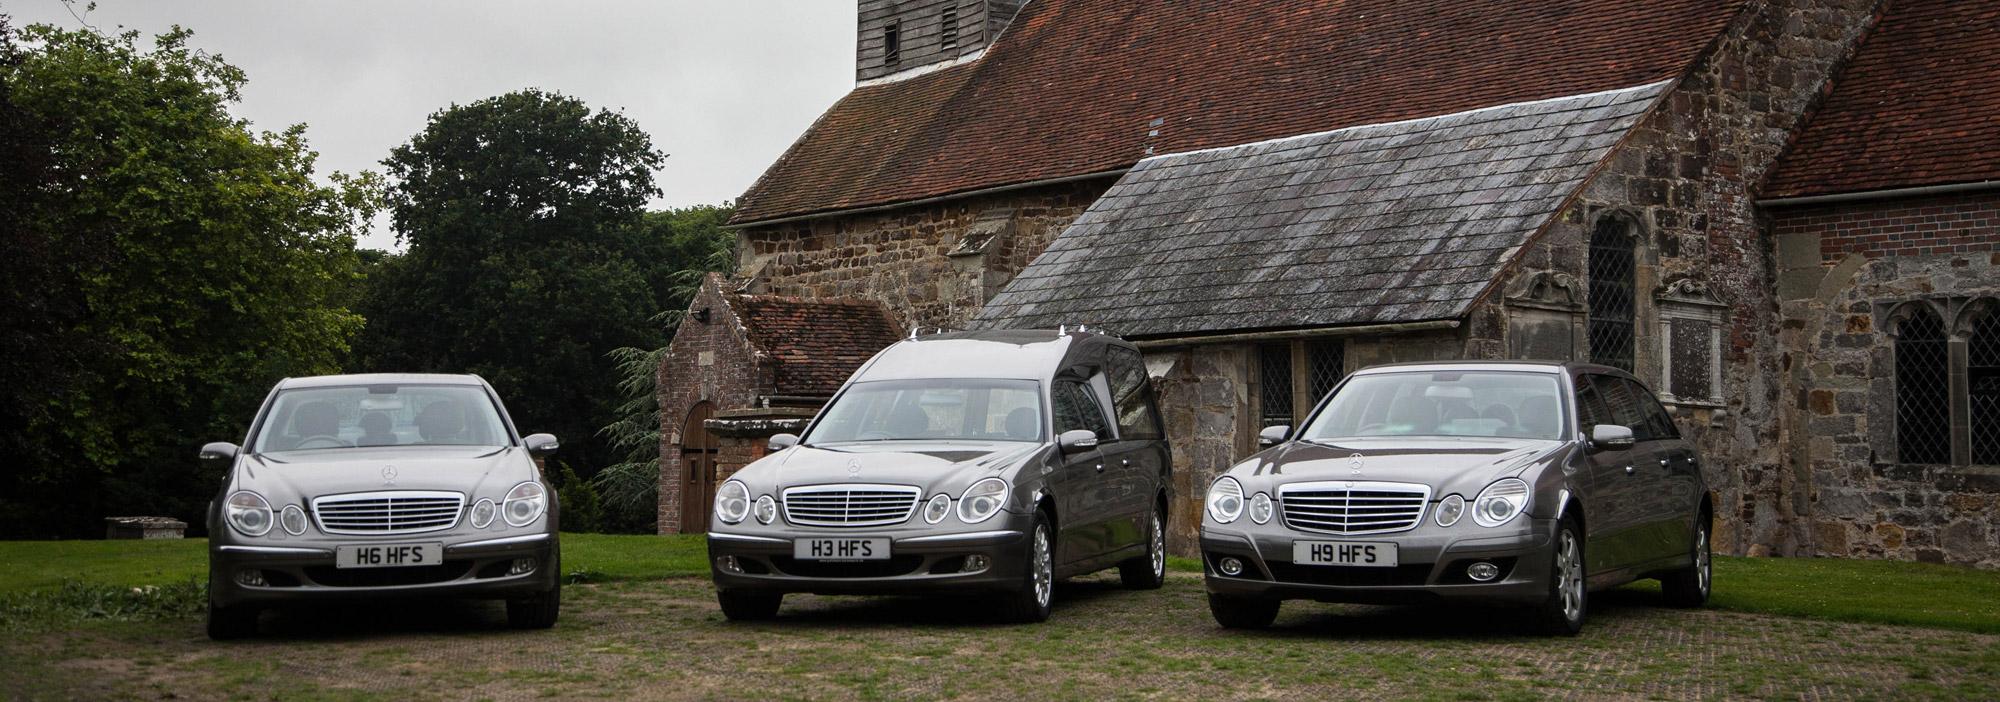 Funeral Cars Hlaisham